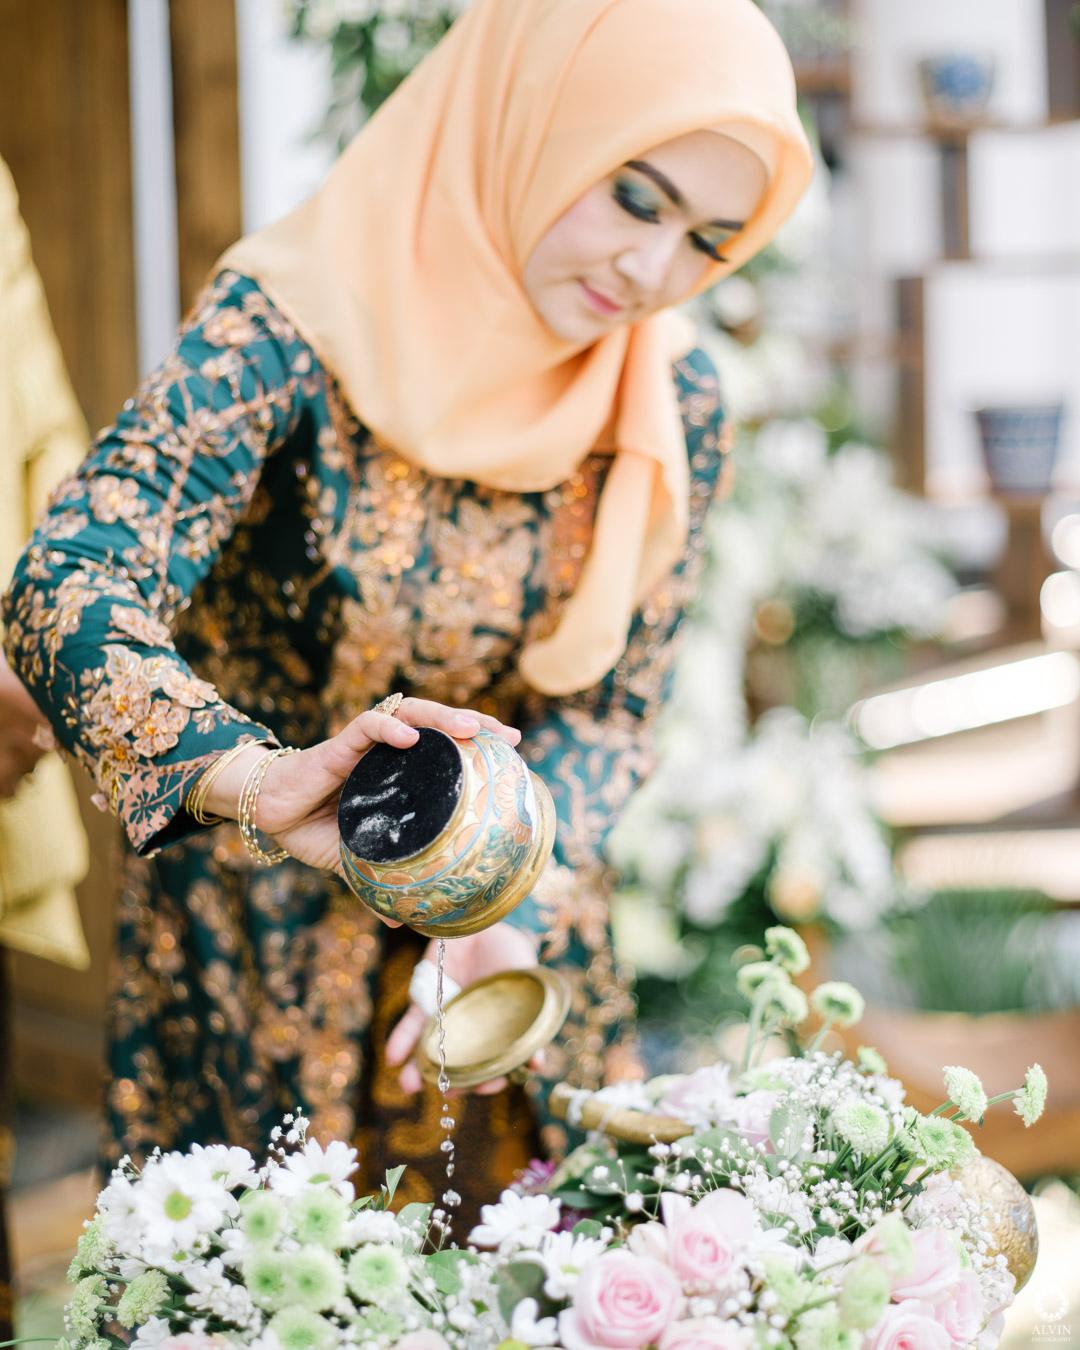 DSCF1023 : Bella & Fahmi Wedding